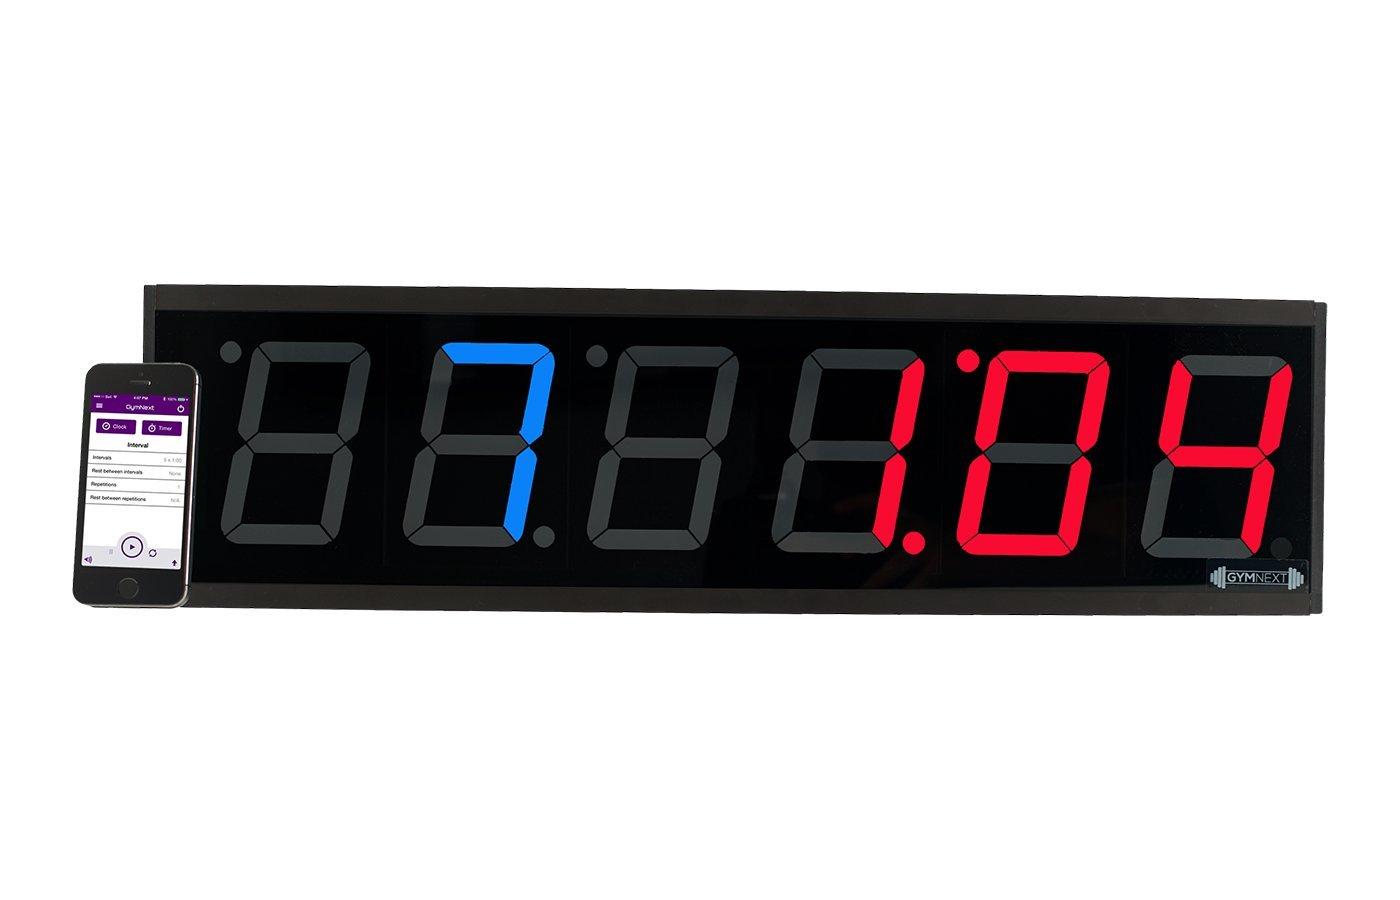 Best crossfit timer clocks review november